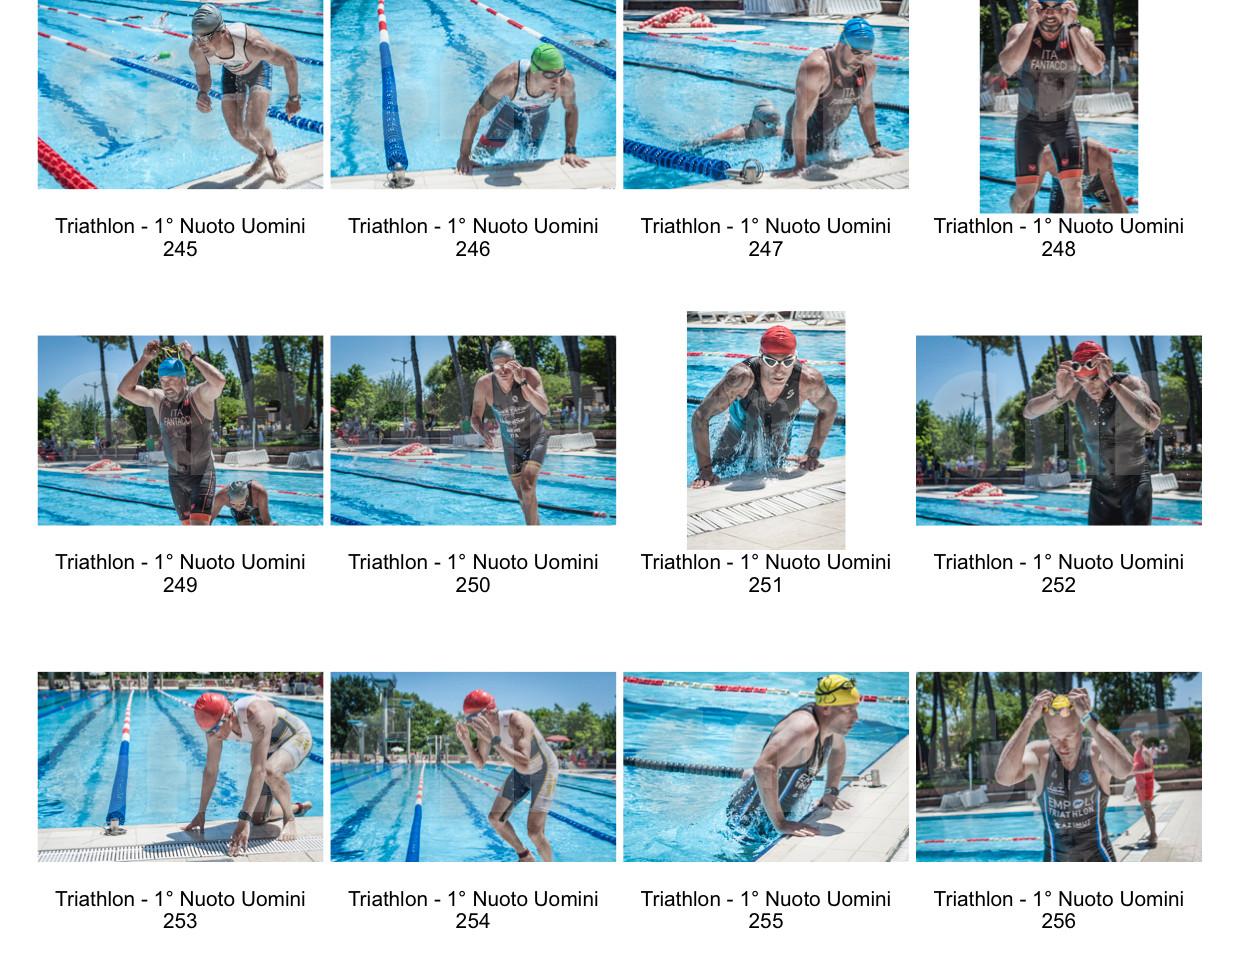 Triathlon_V.Elsa_-_1°_Frazione_Nuoto_Uomini_-13.jpg